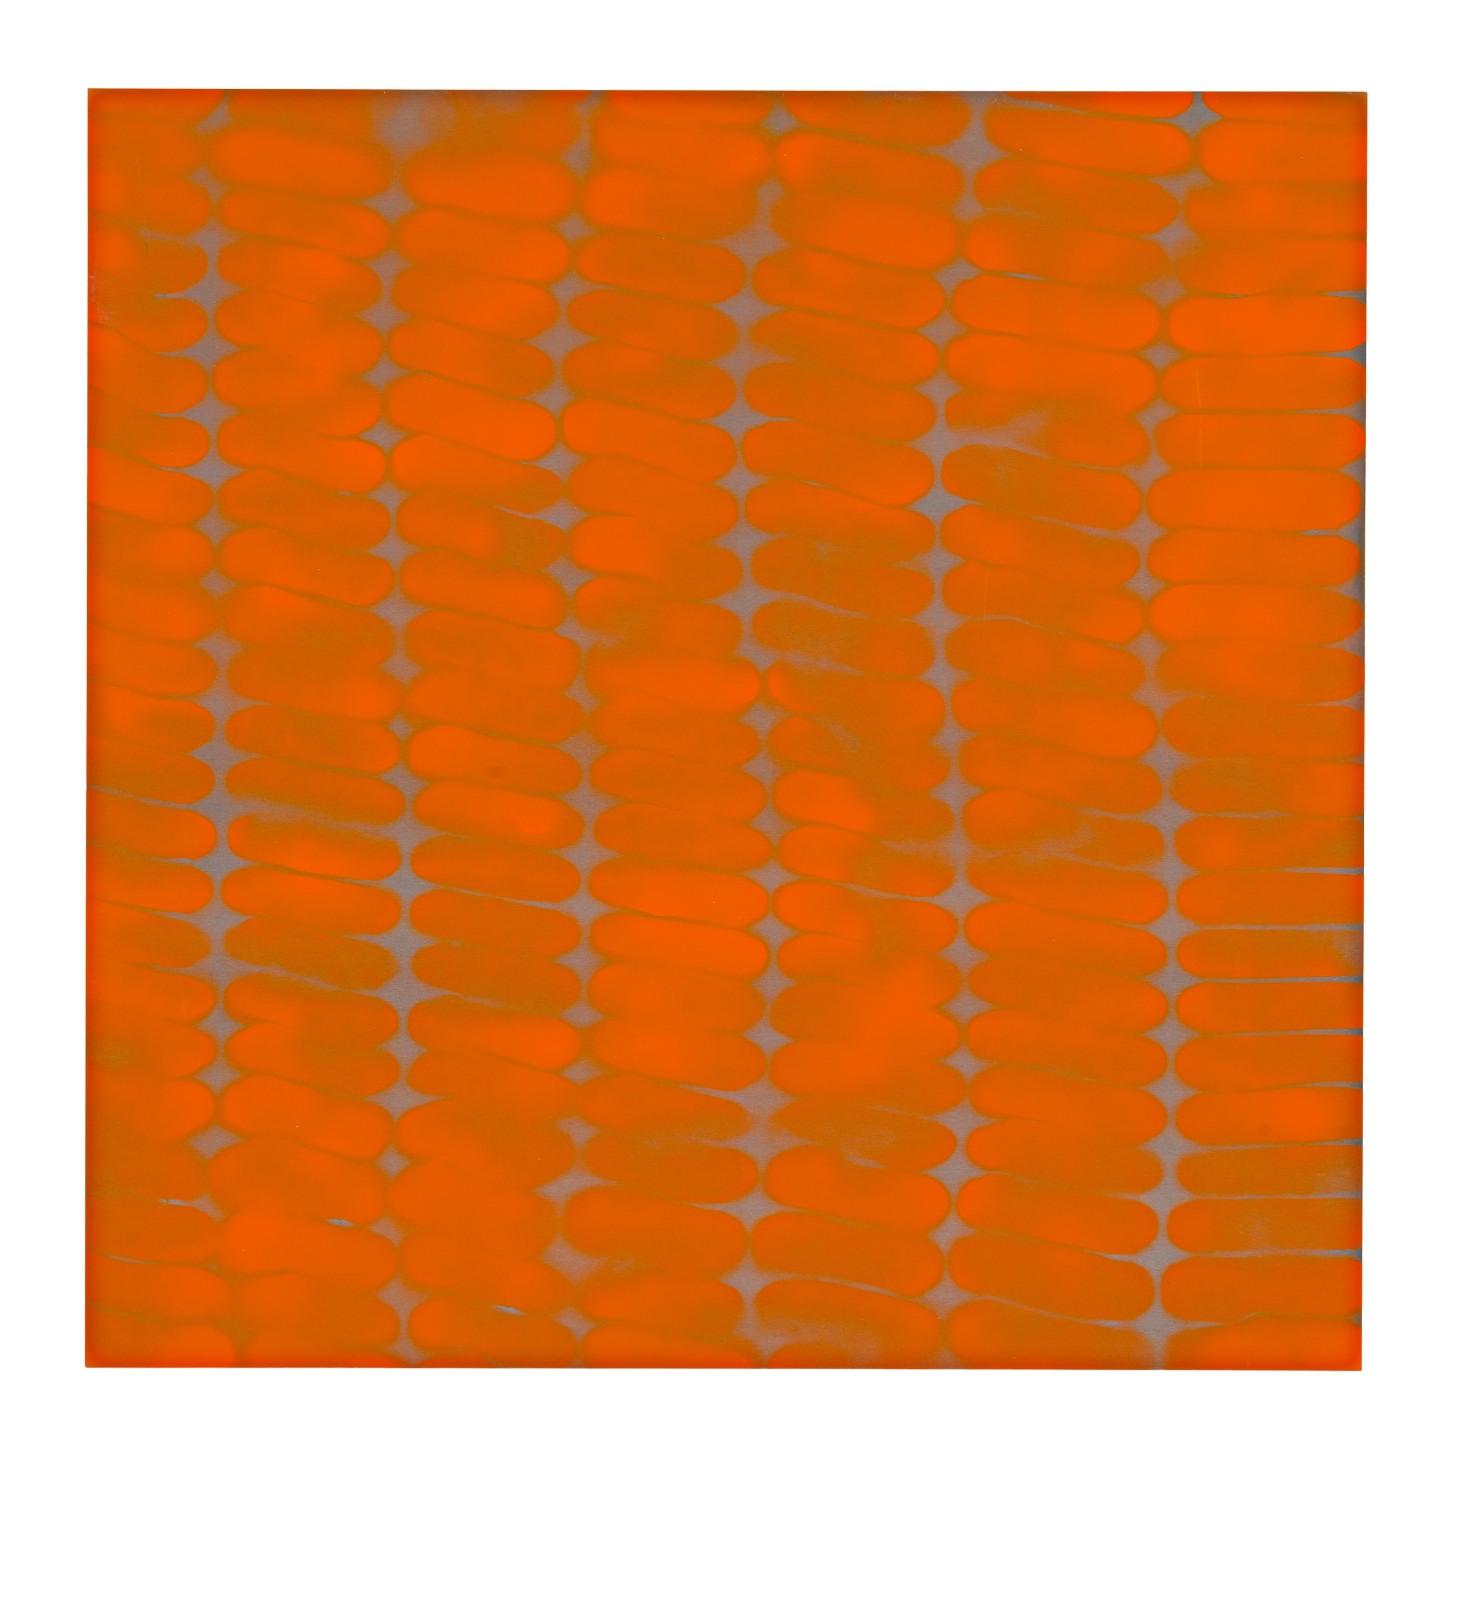 "STAIN : 40°43'23.3""N 73°56'12.7""W, 2015, spraypaint on aluminium, 81,3 x 81,3 cm"